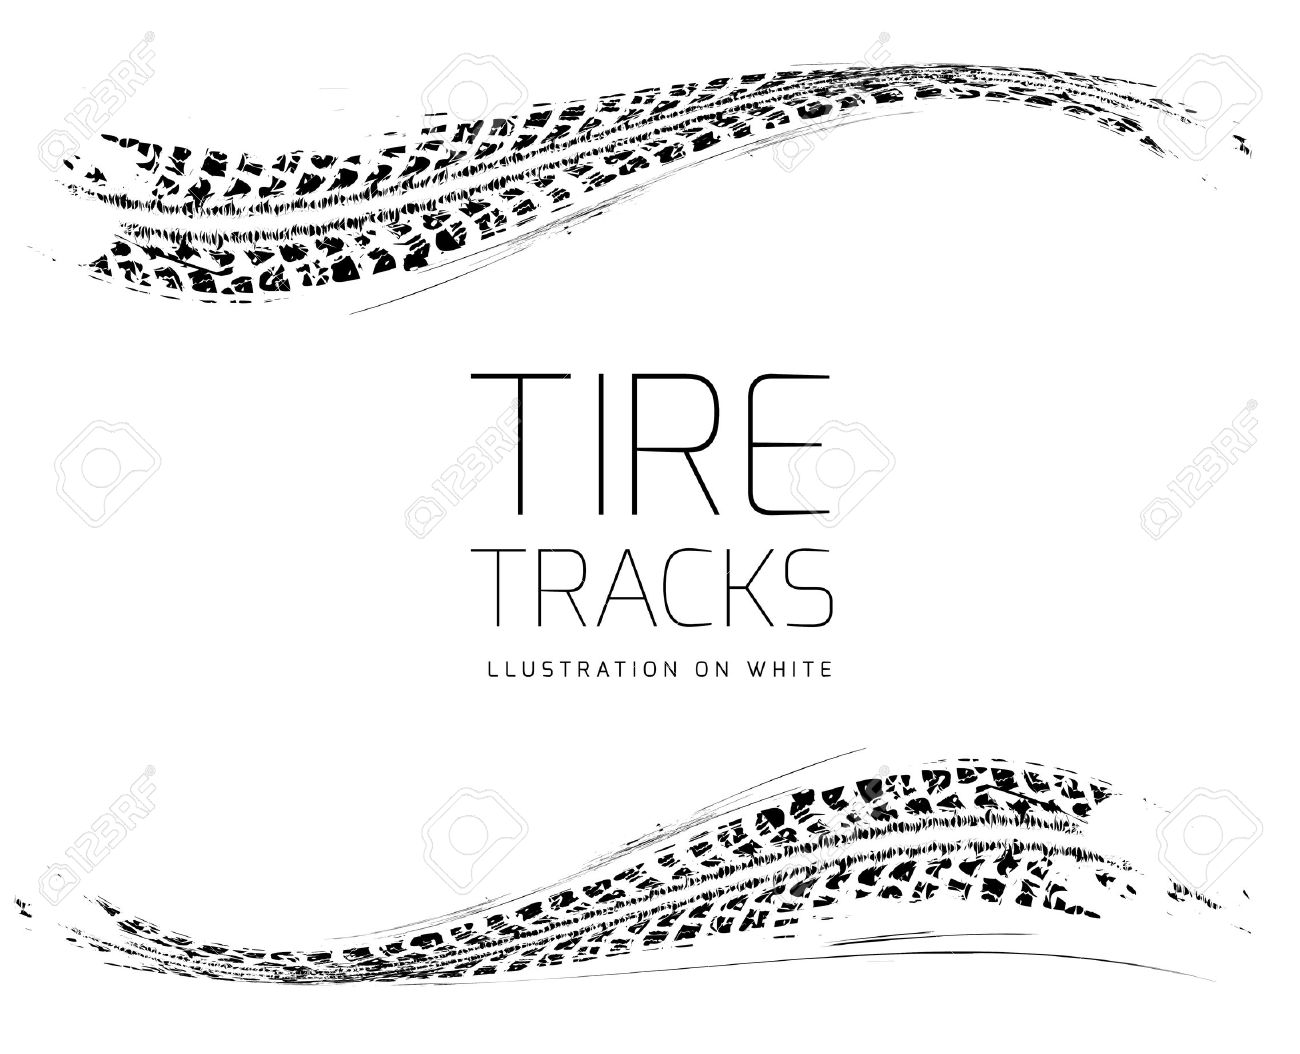 Tire tracks background - 38663678